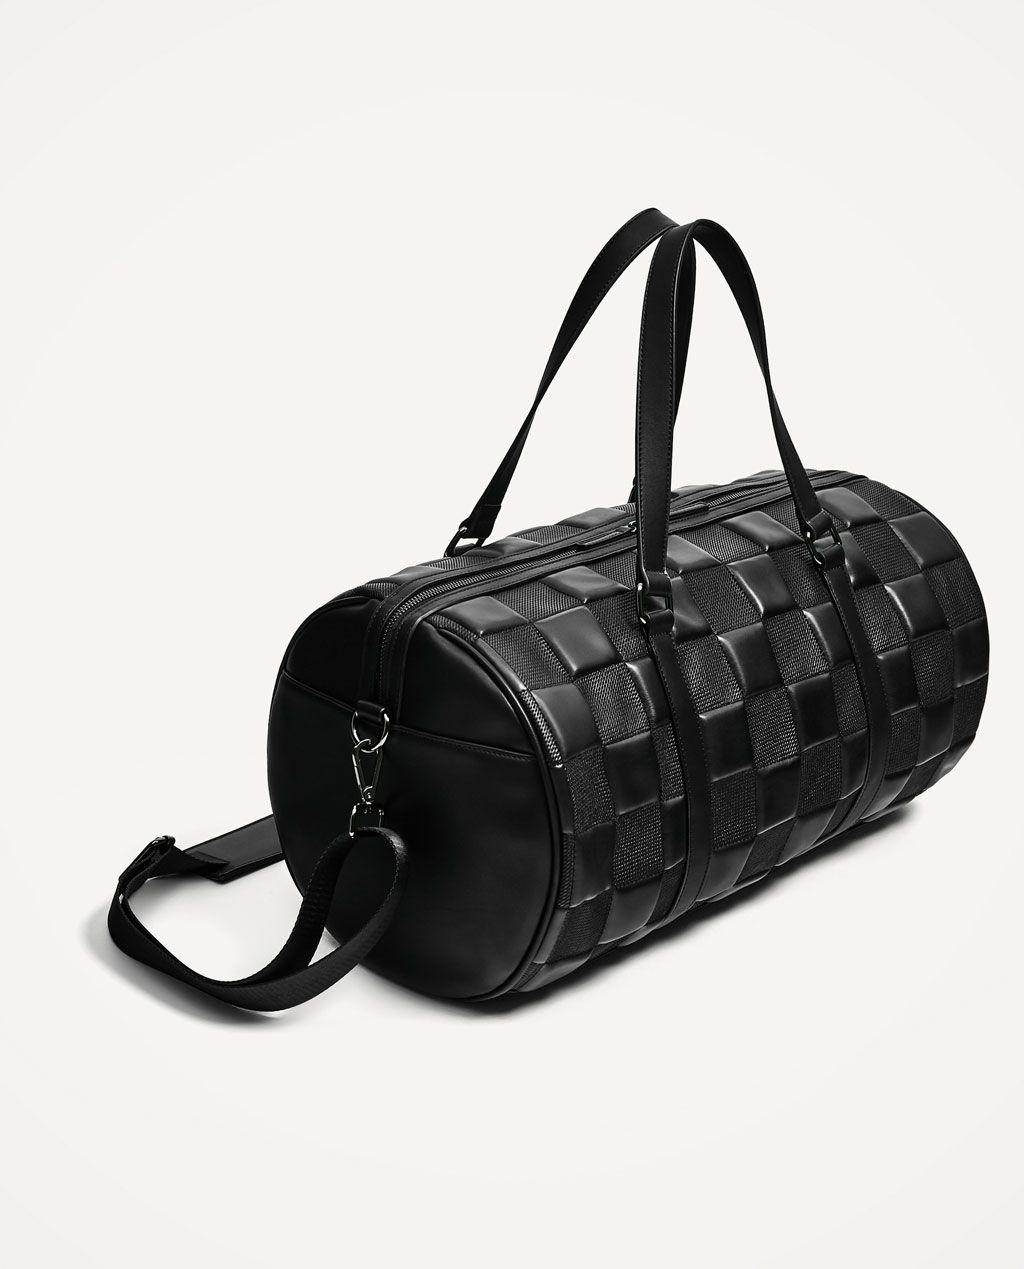 Image Sac ZaraMen Bags Noir 1 De Matelassé Bowling 9WD2YEIH